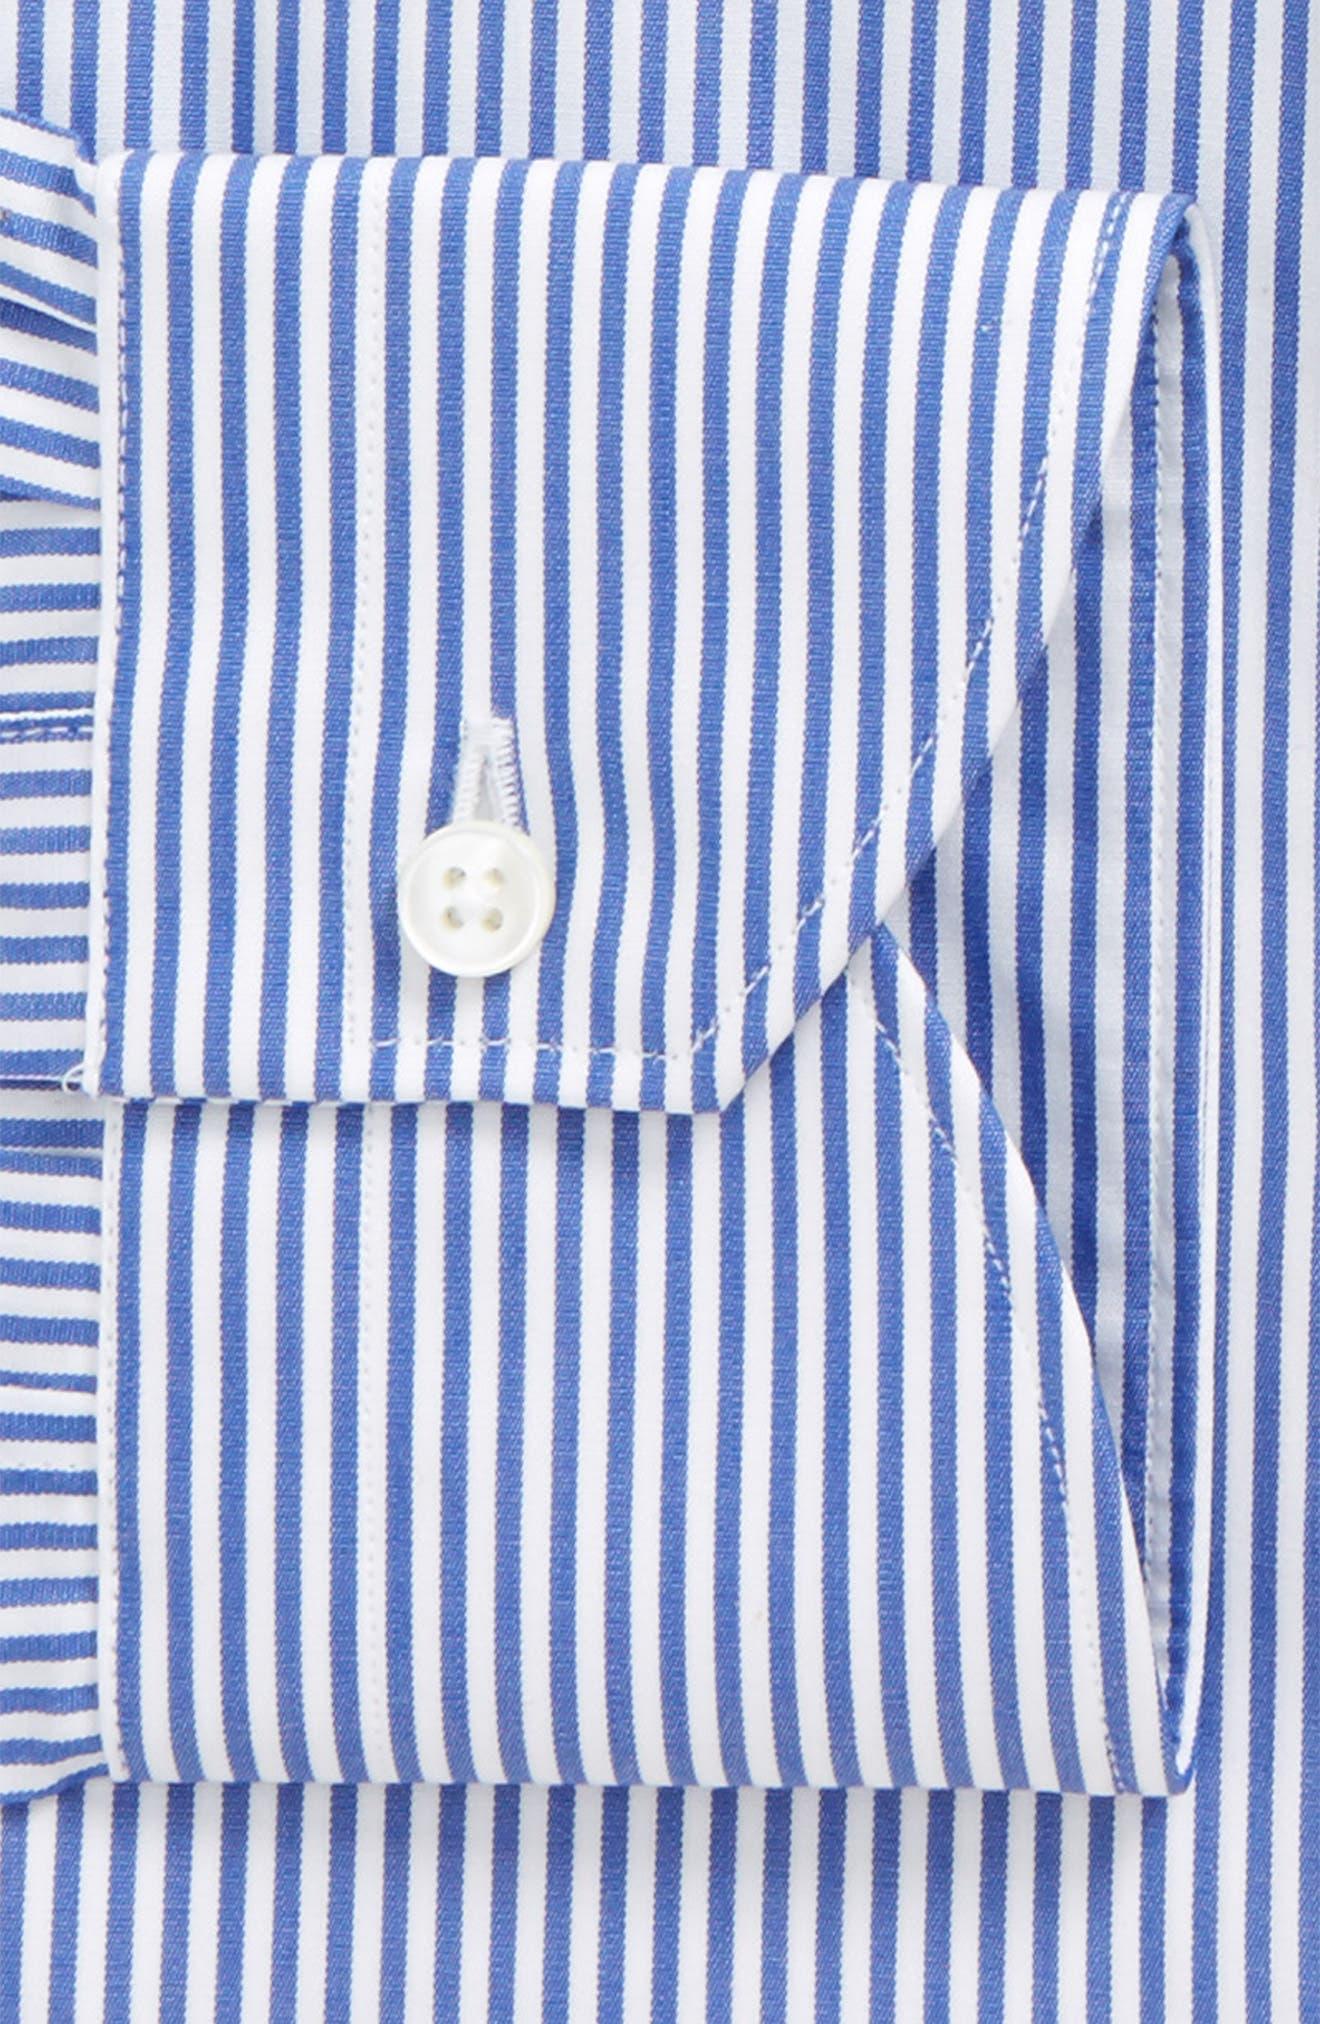 Regular Fit Stripe Dress Shirt,                             Alternate thumbnail 2, color,                             410